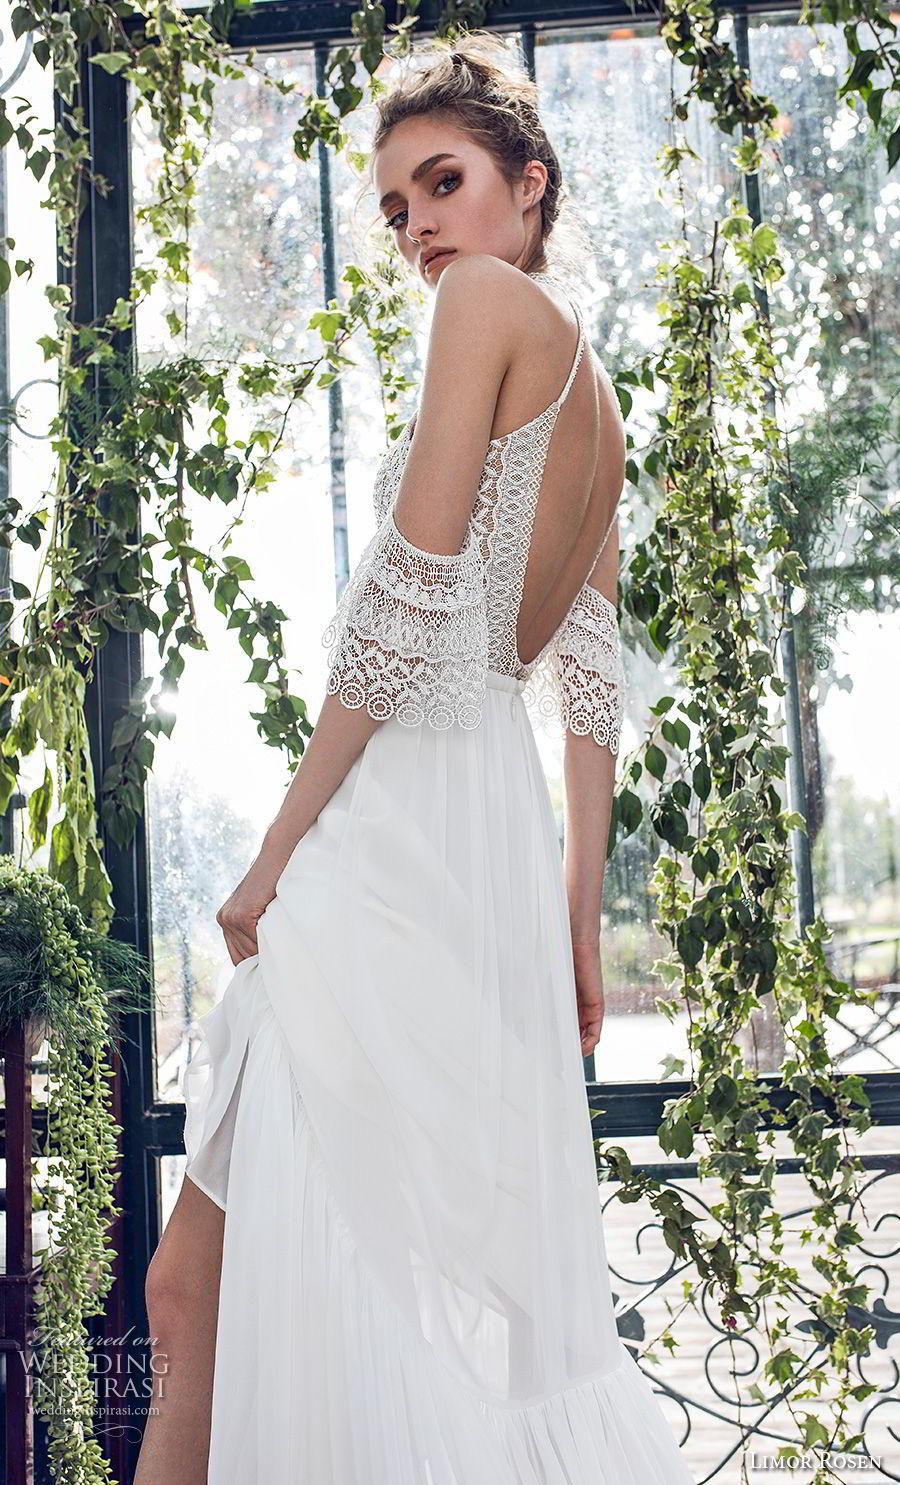 limor rosen 2019 xo bridal cold soulder halter jewel neck heavily embellished bodice romantic soft a  line wedding dress open back medium train (10) zbv